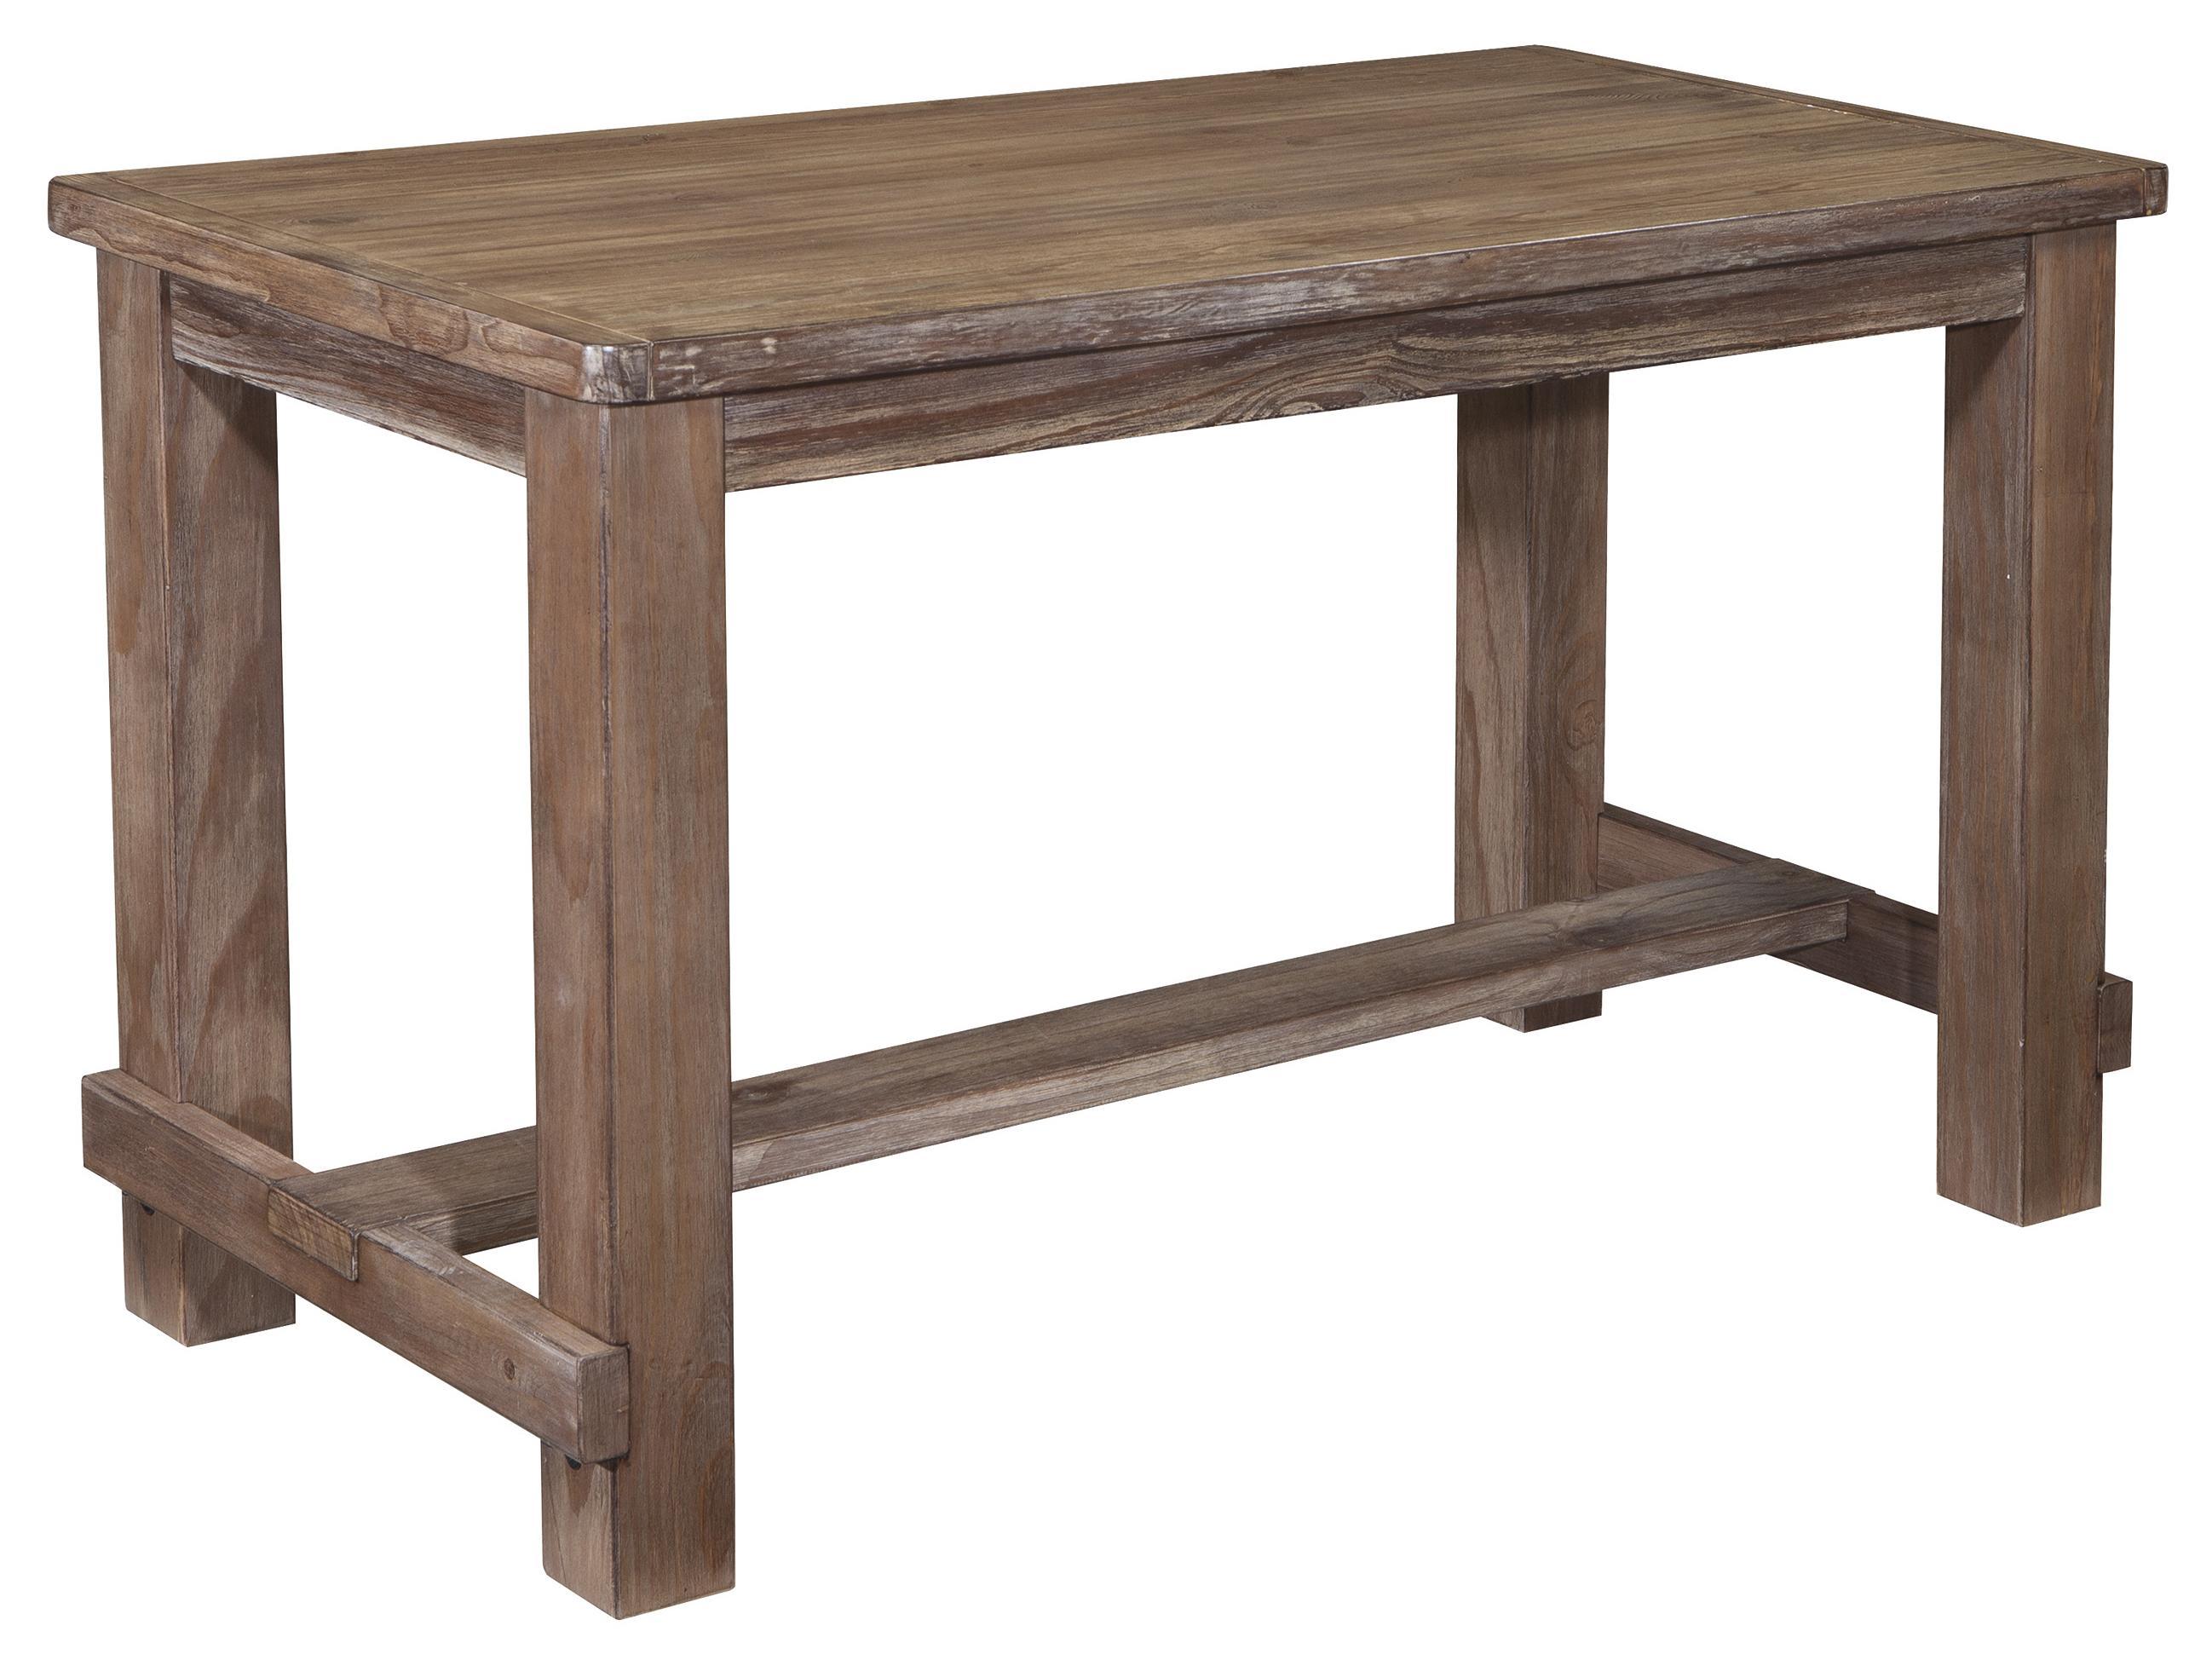 Rectangular Pine Veneer Dining Room Counter Table In Wire